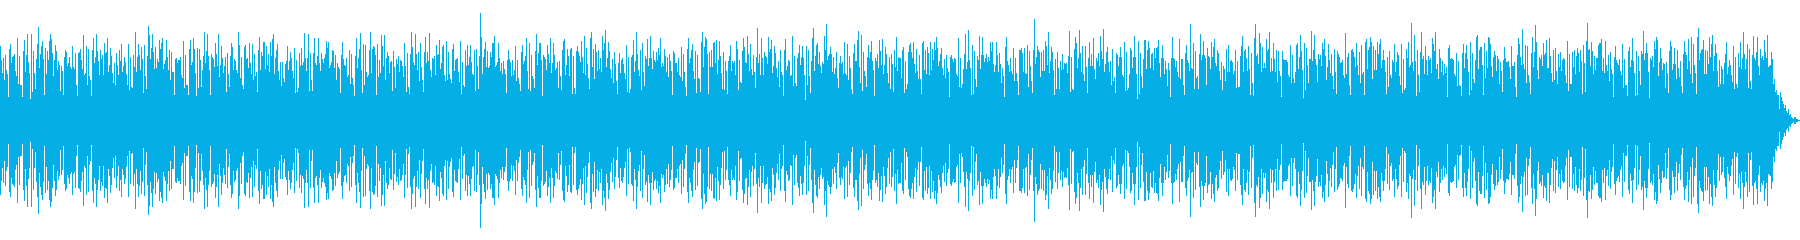 YouTube キャンプ・アウトドア動画の再生済みの波形